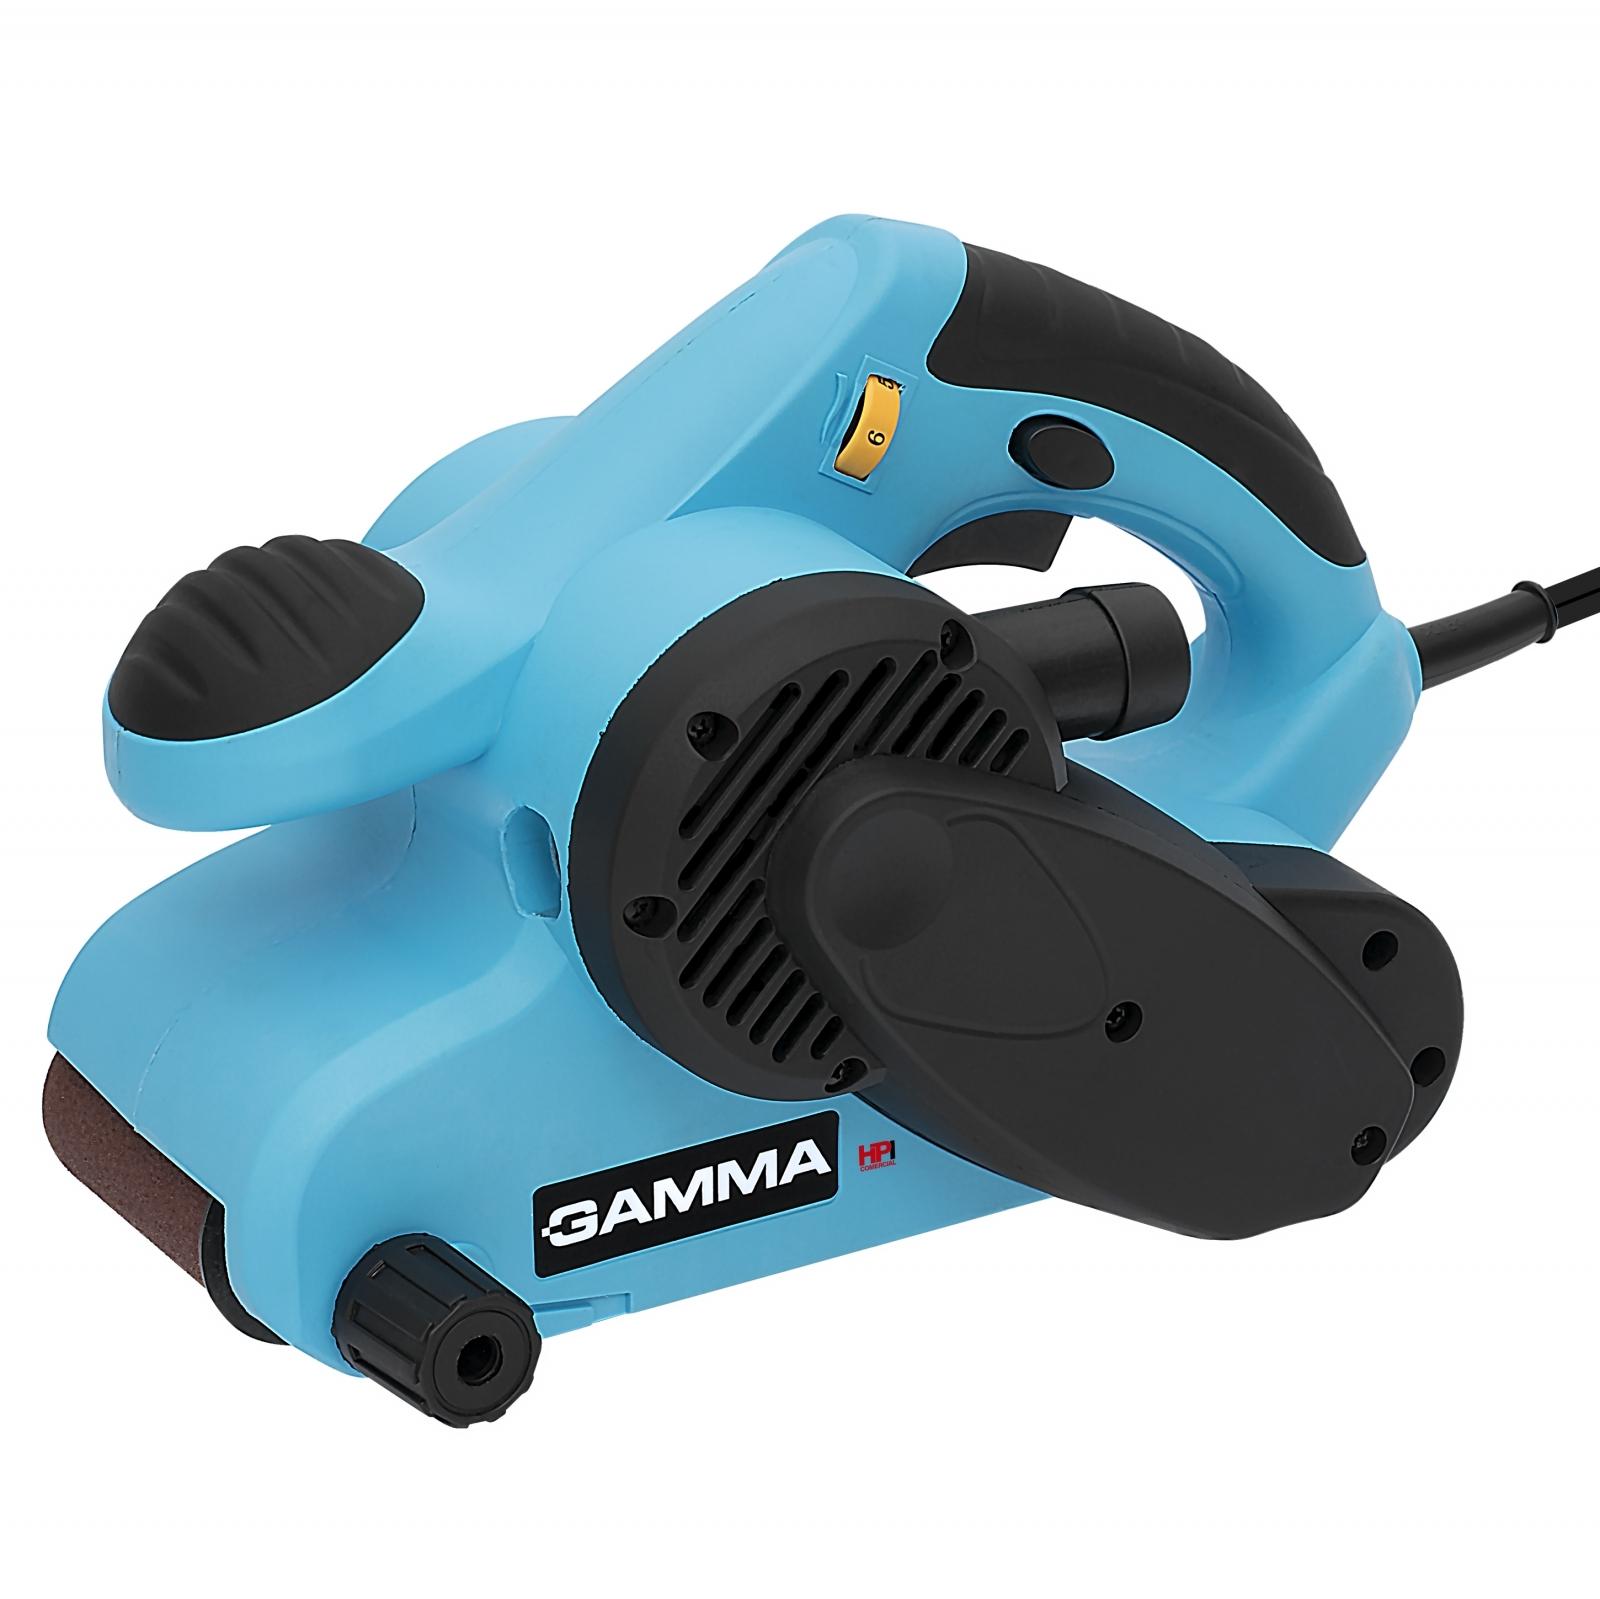 Lixadeira de Cinta Gamma 850 Watts Profissional para Madeira Lc1 - Ferramentas MEP